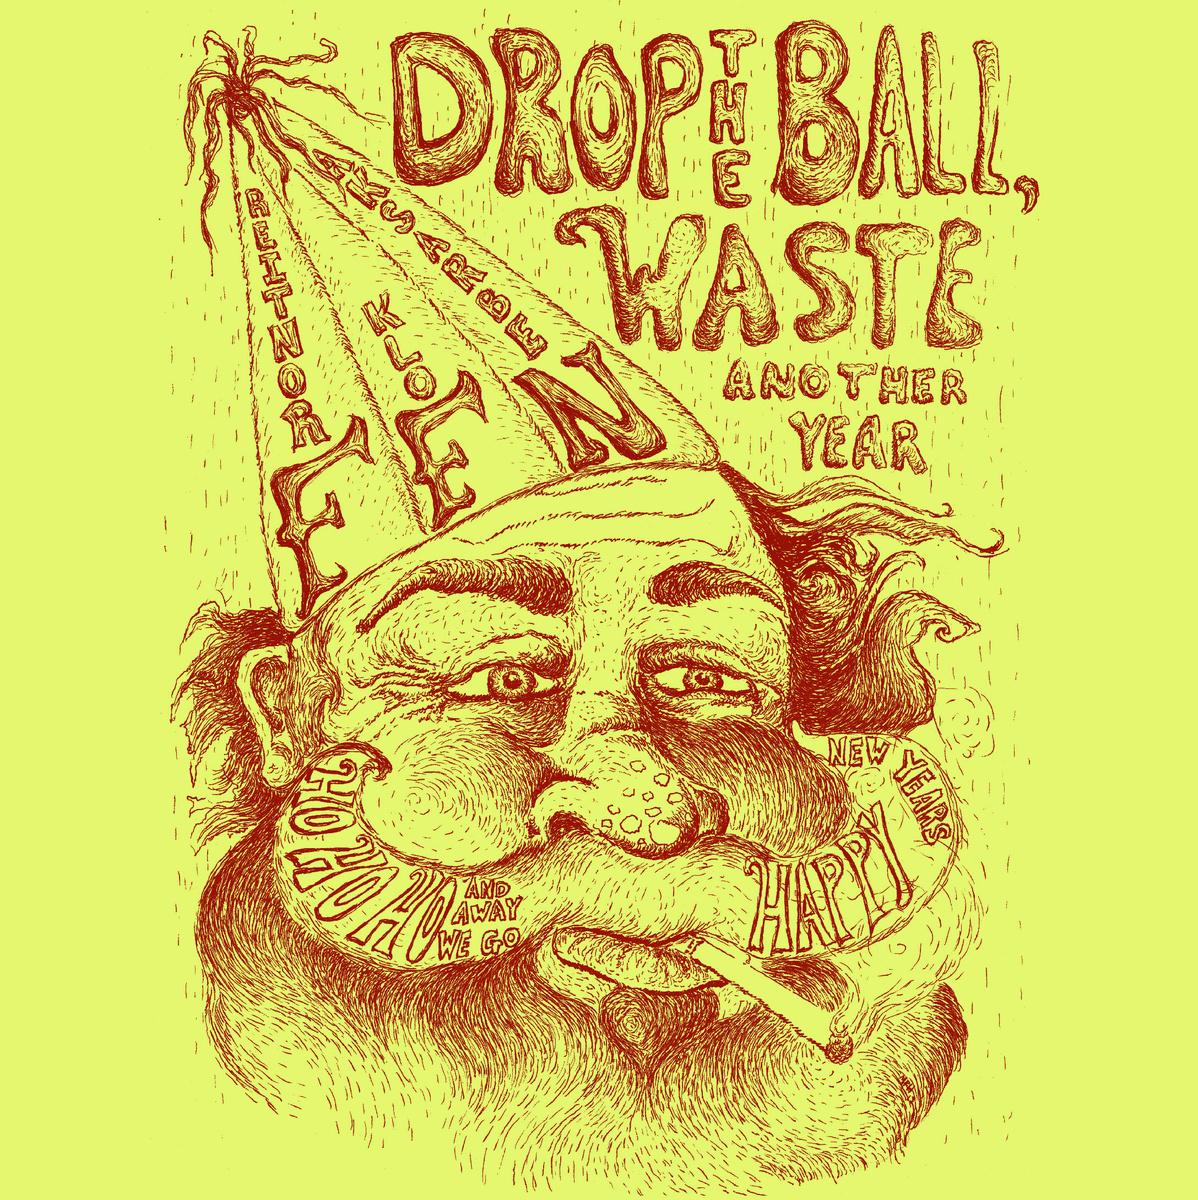 "Frontier Folk Nebraska - Drop the Ball, Waste Another Year 7"""